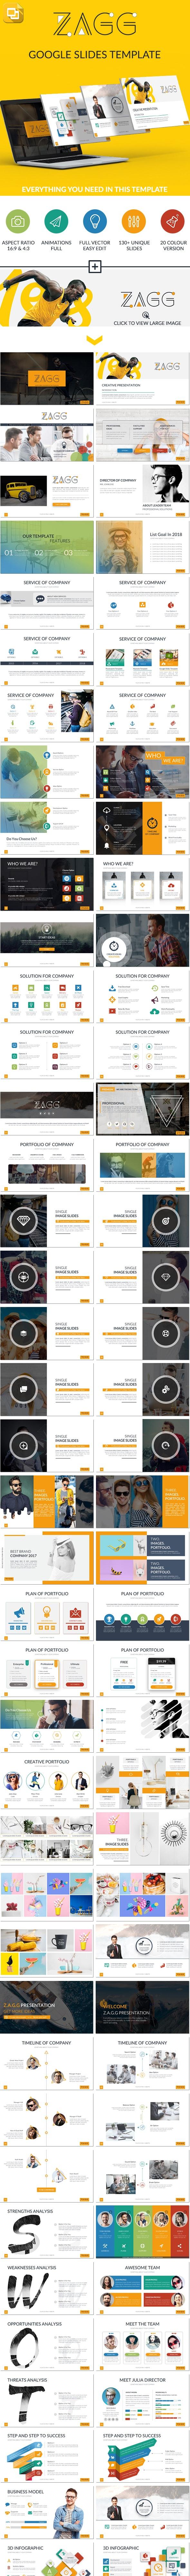 Zagg Google Slides Presentation Template - Google Slides Presentation Templates